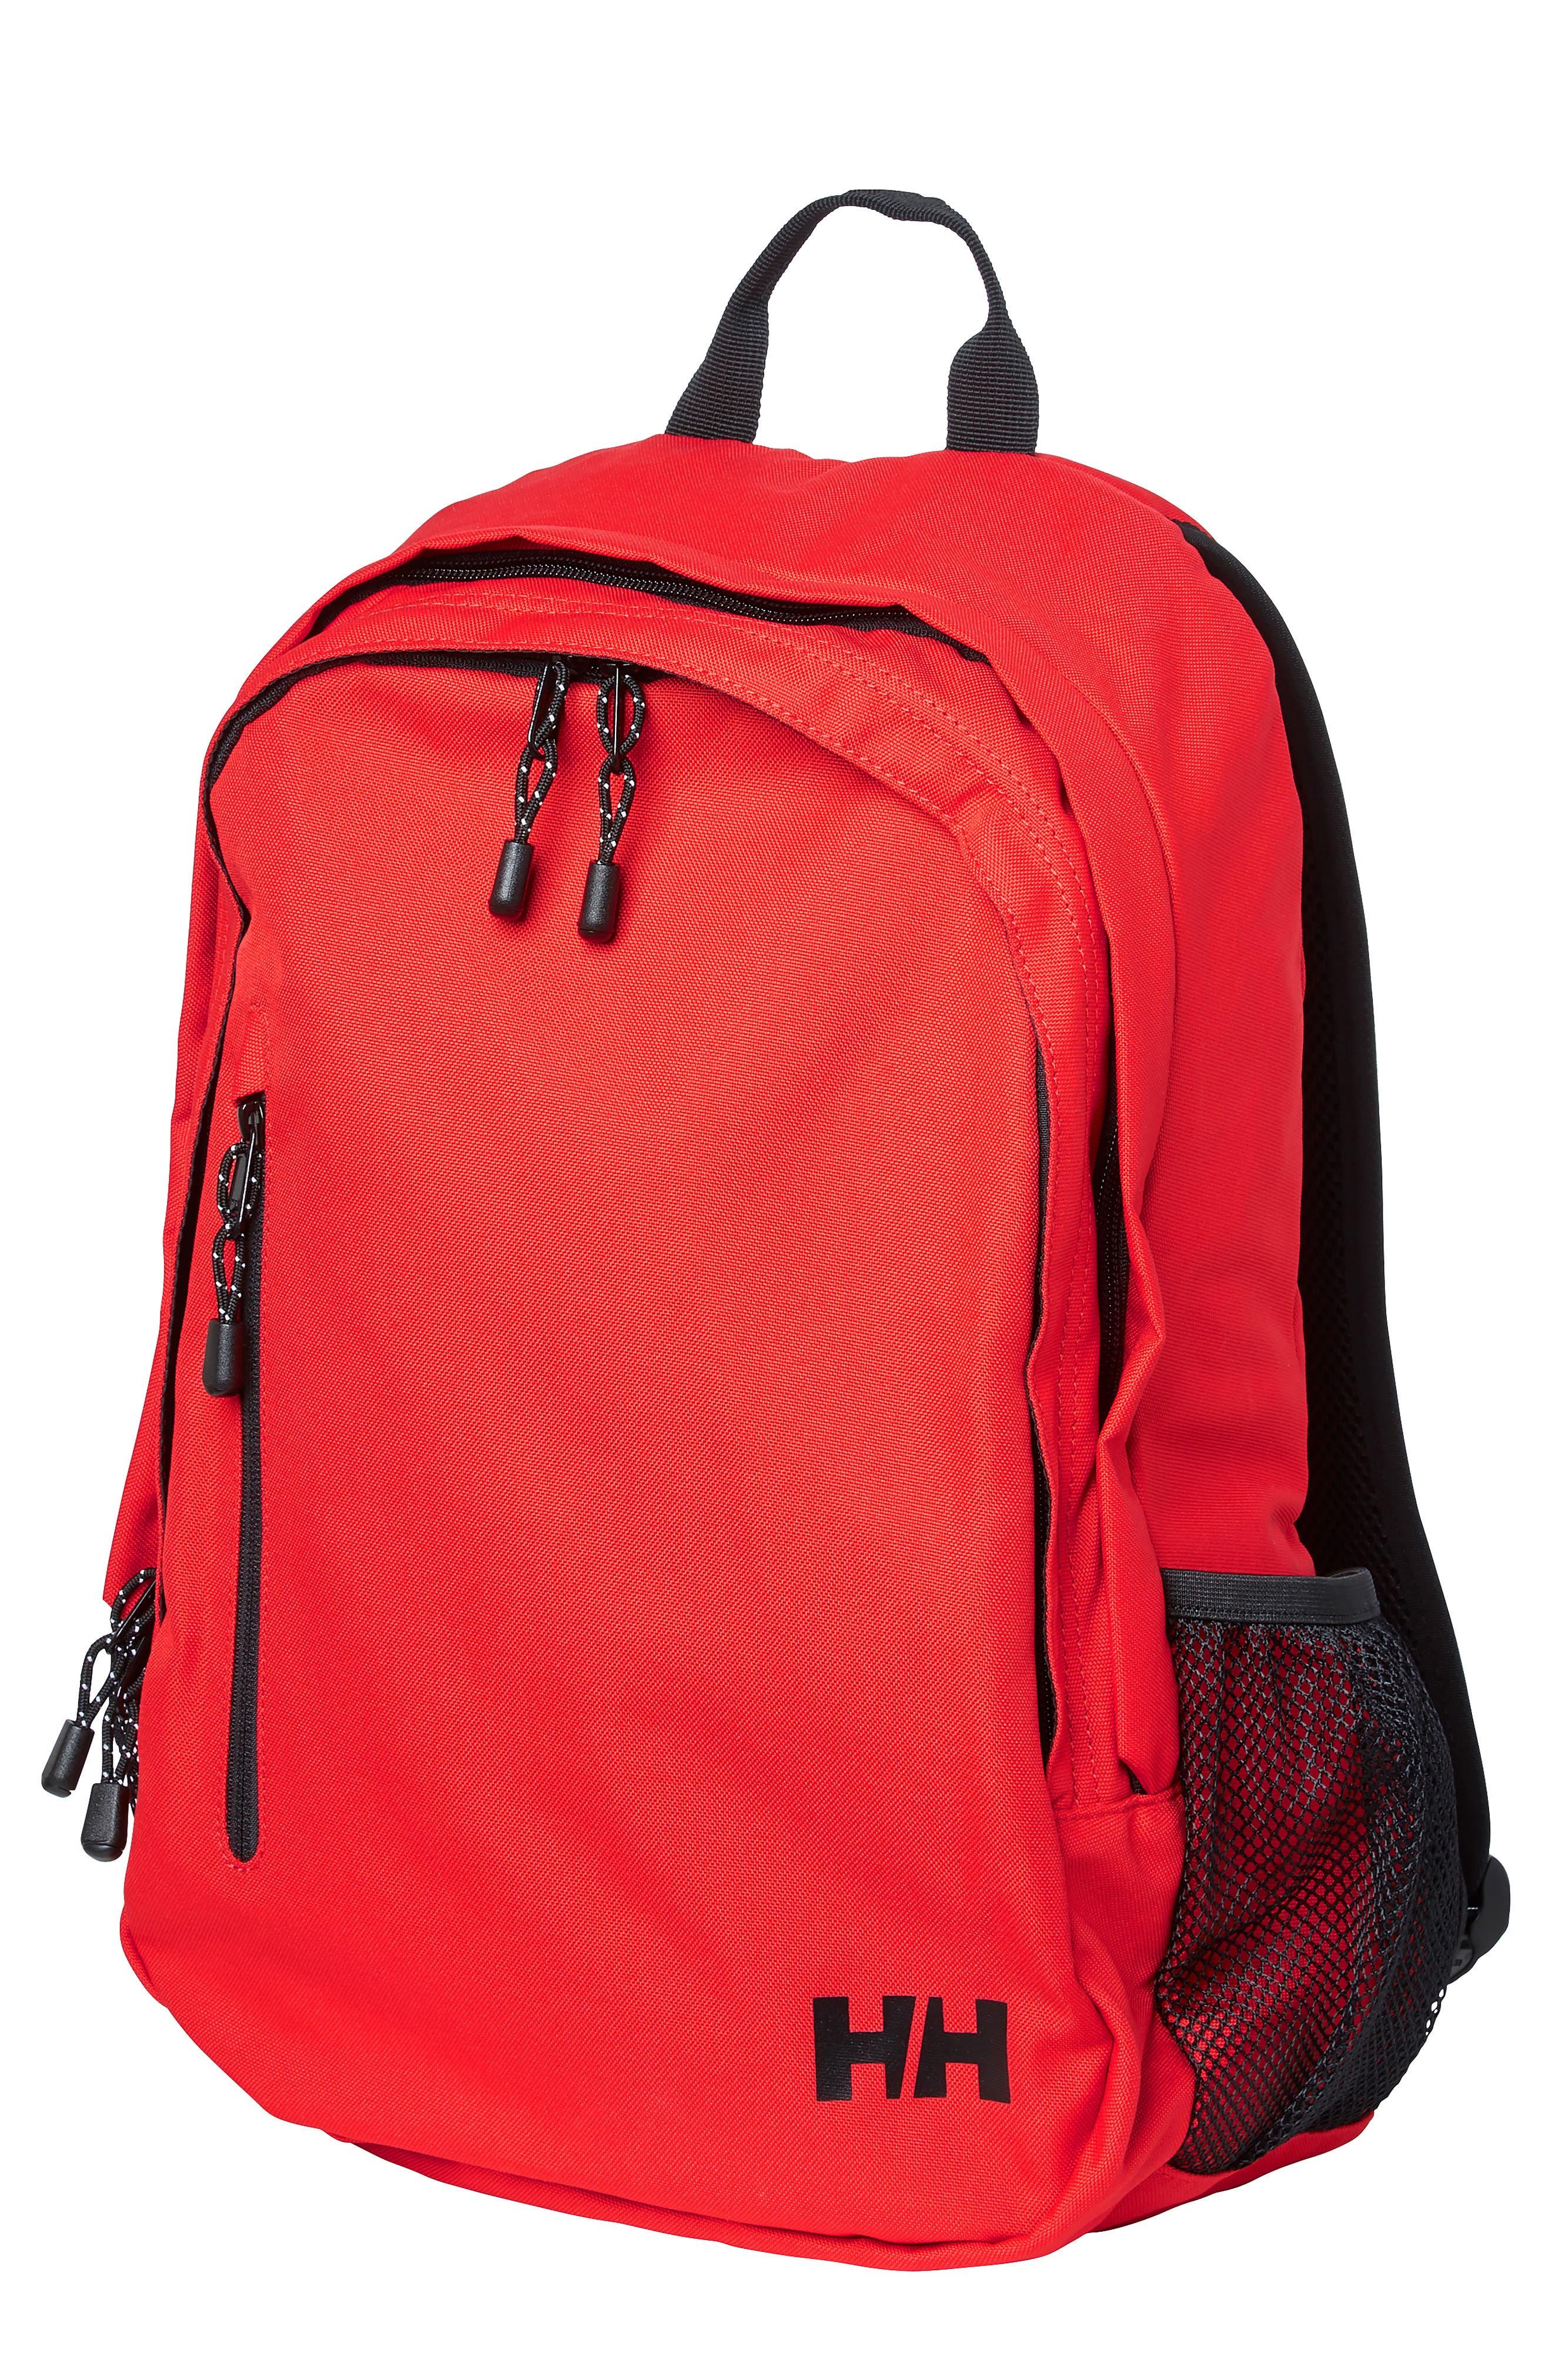 HELLY HANSEN, Dublin Backpack, Main thumbnail 1, color, ALERT RED